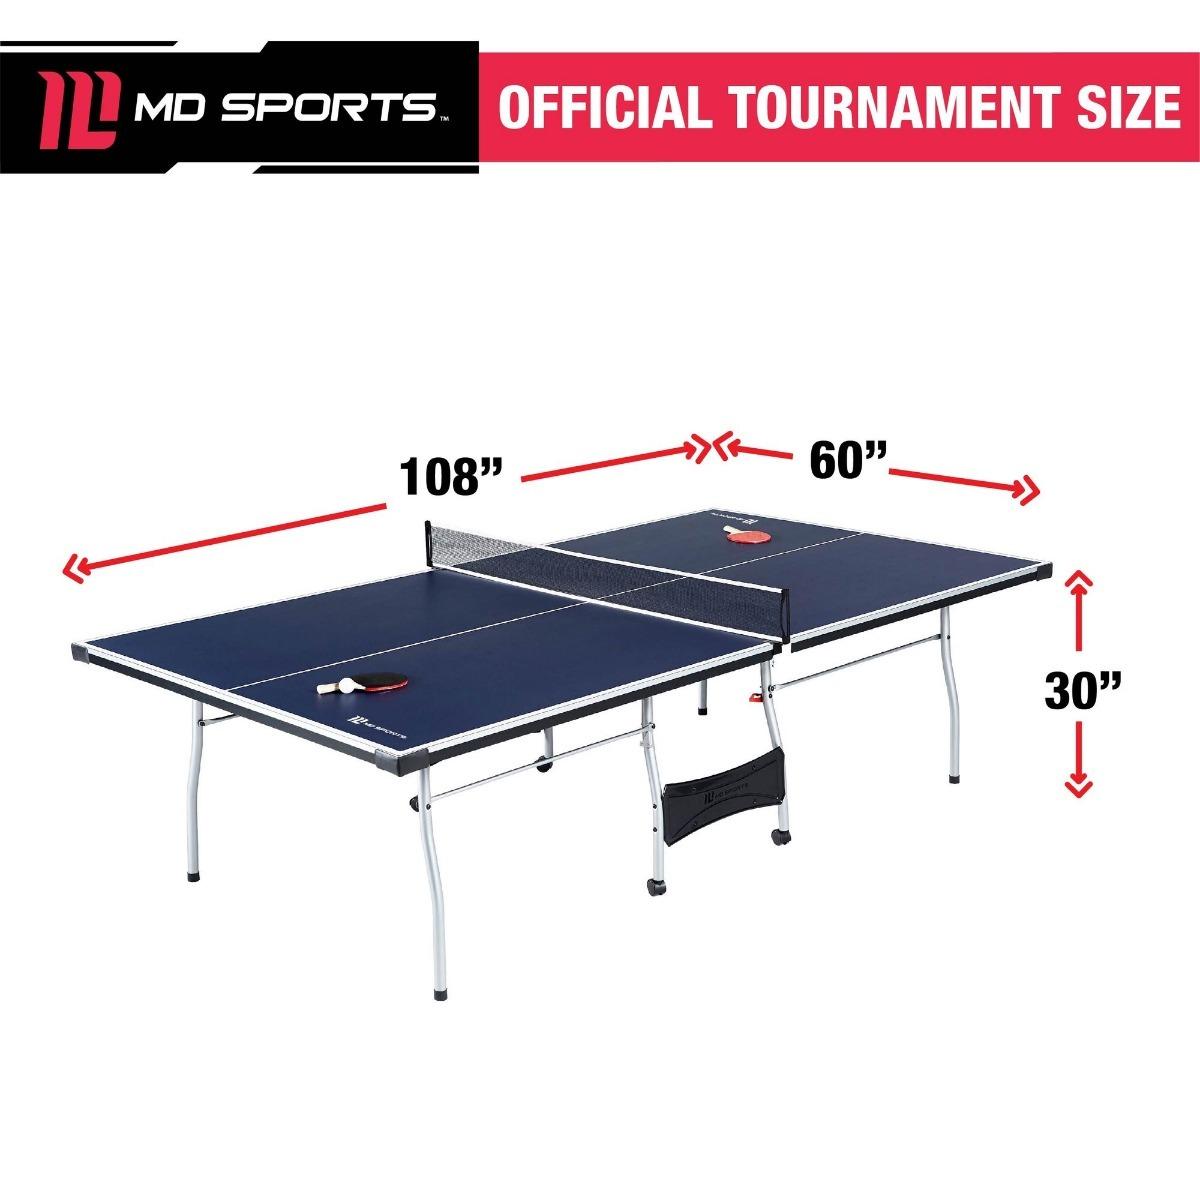 476d61d24 tabla de tenis de mesa de tamaño oficial md sports. Cargando zoom.